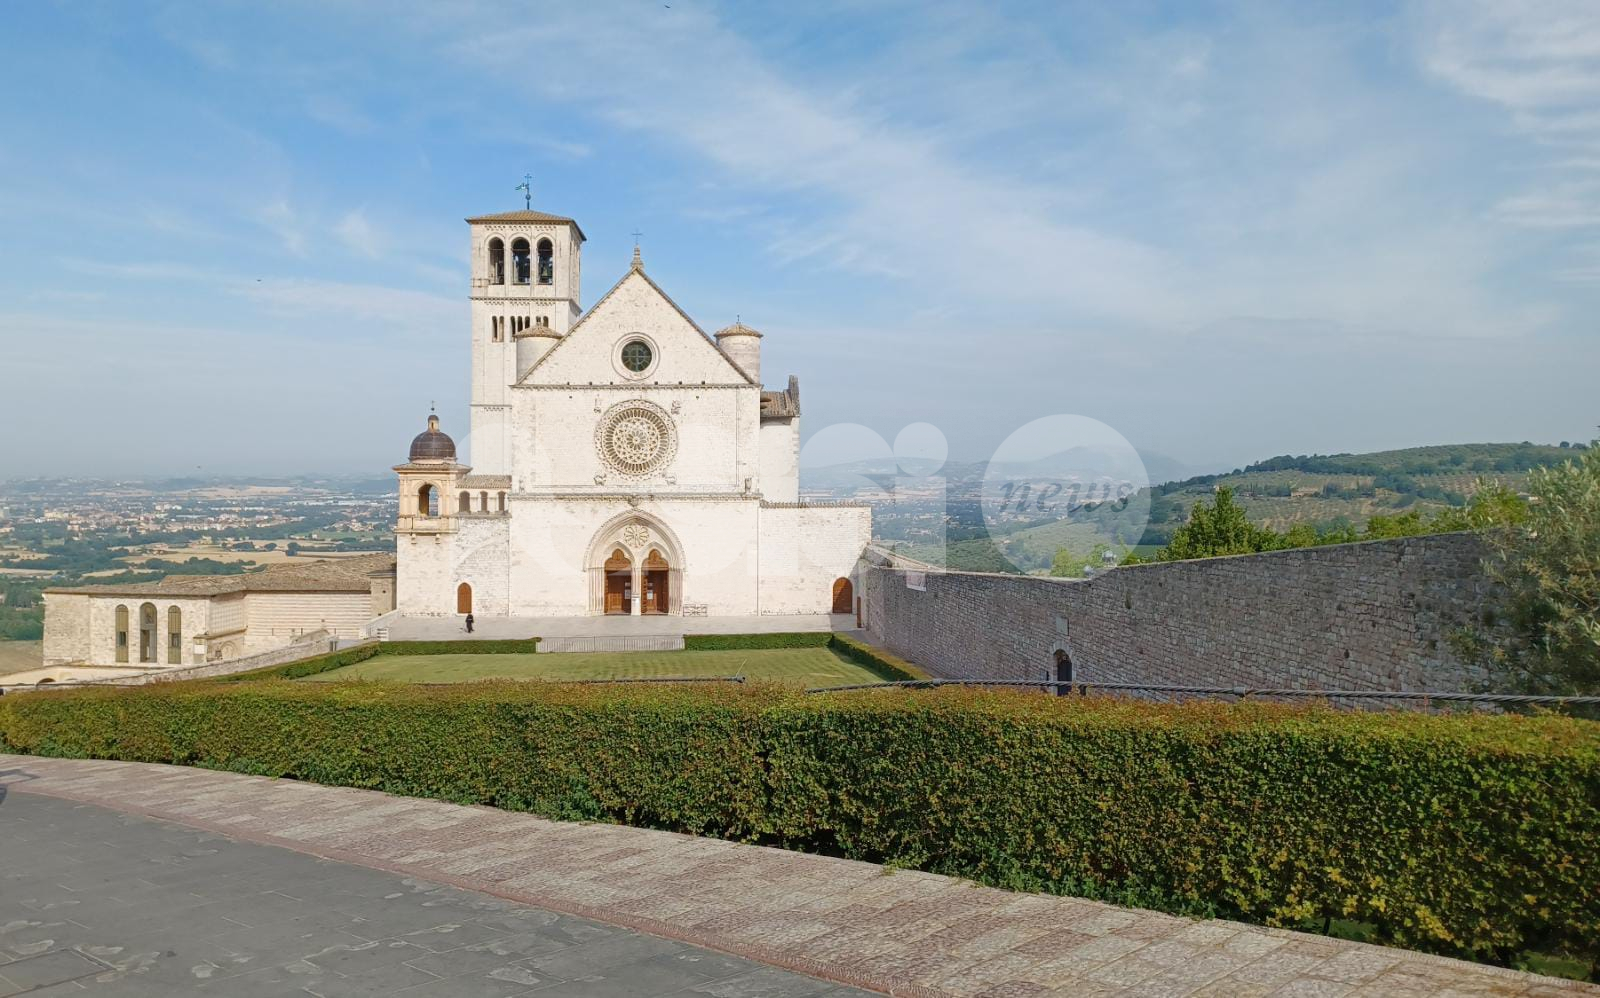 Giornate dantesche 2021, visita guidata gratuita a San Francesco sabato 26 giugno